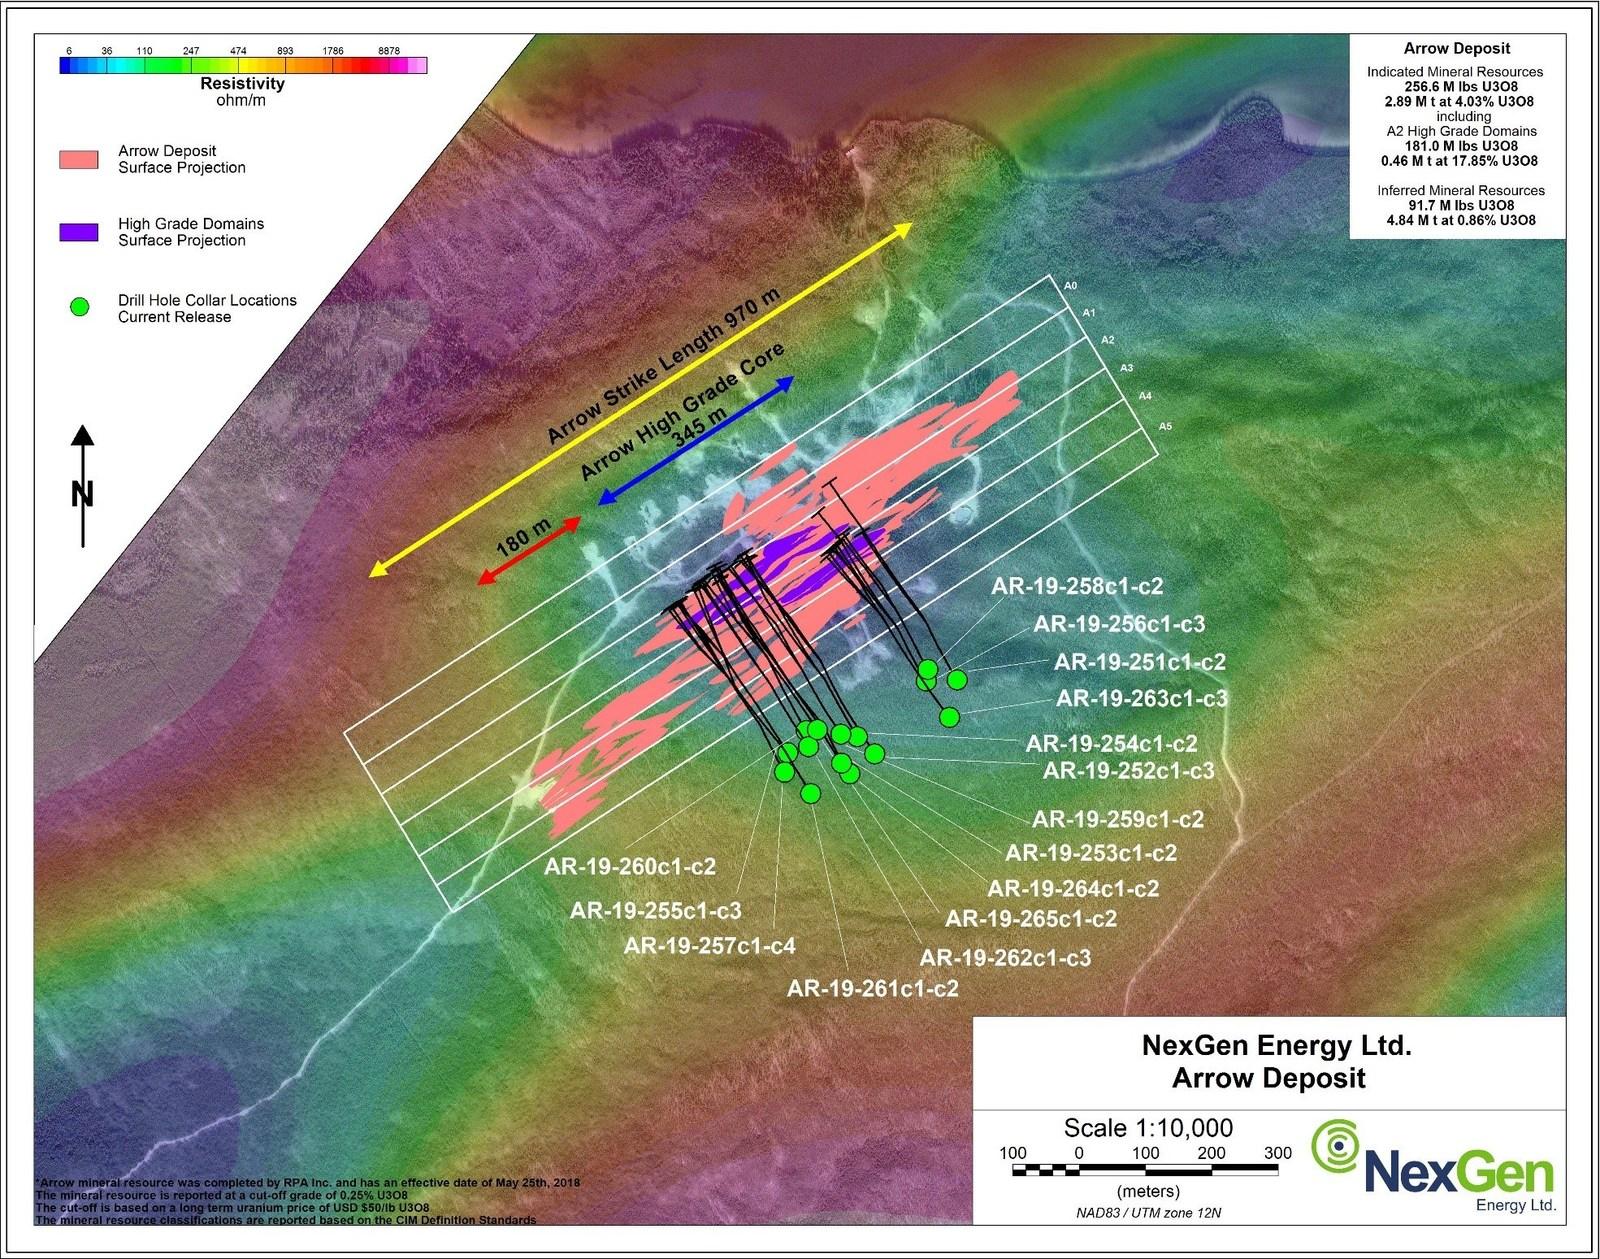 Figure 1: Arrow Deposit Drill Hole Locations